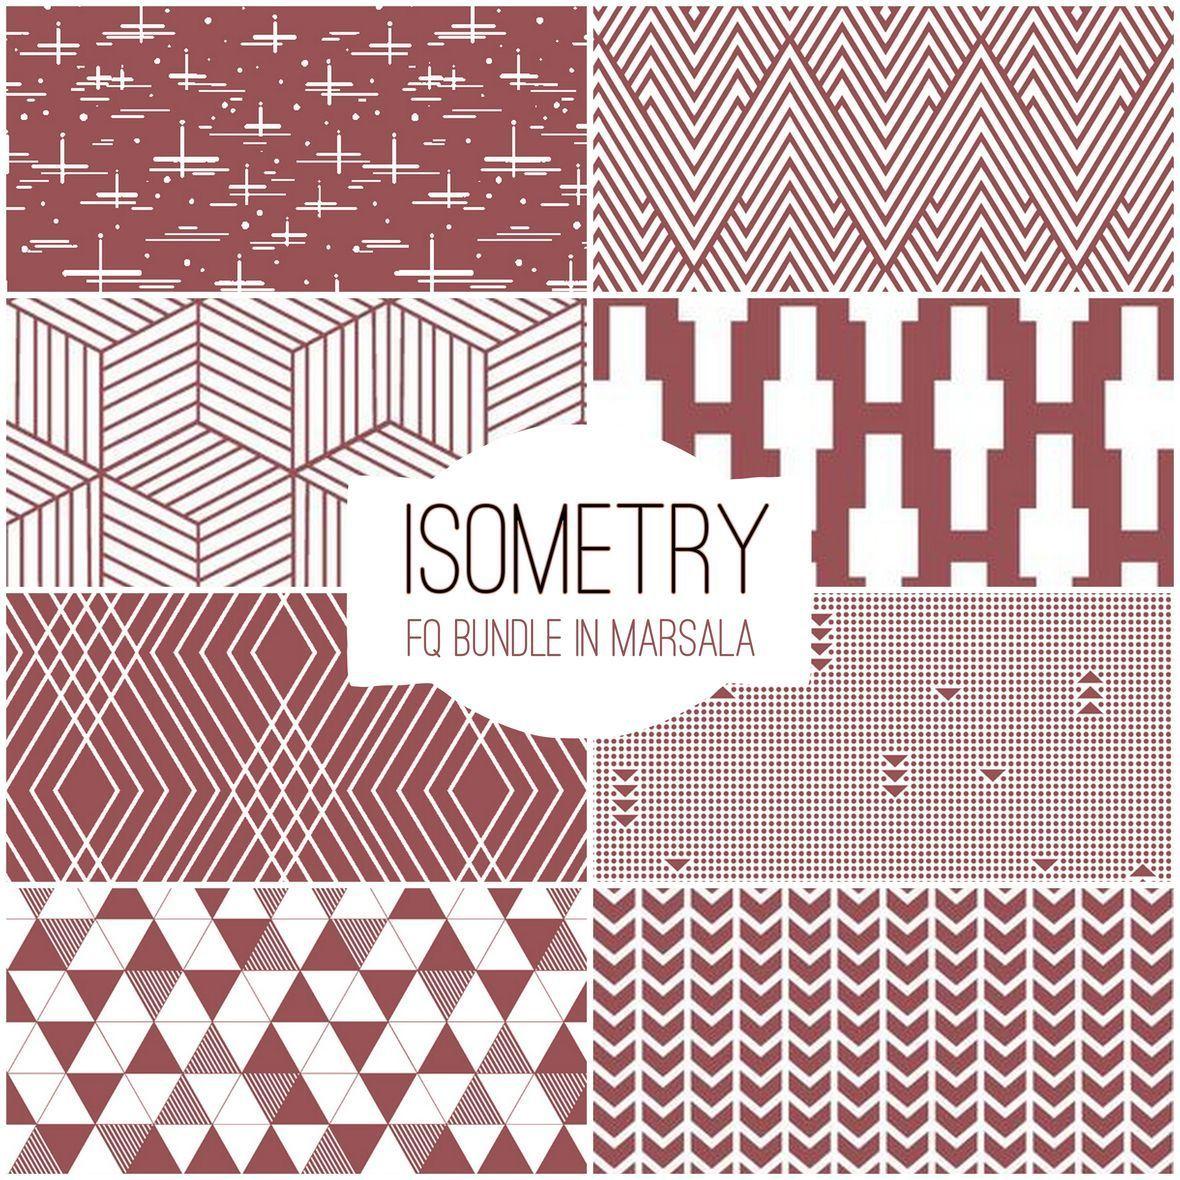 Isometry in Marsala